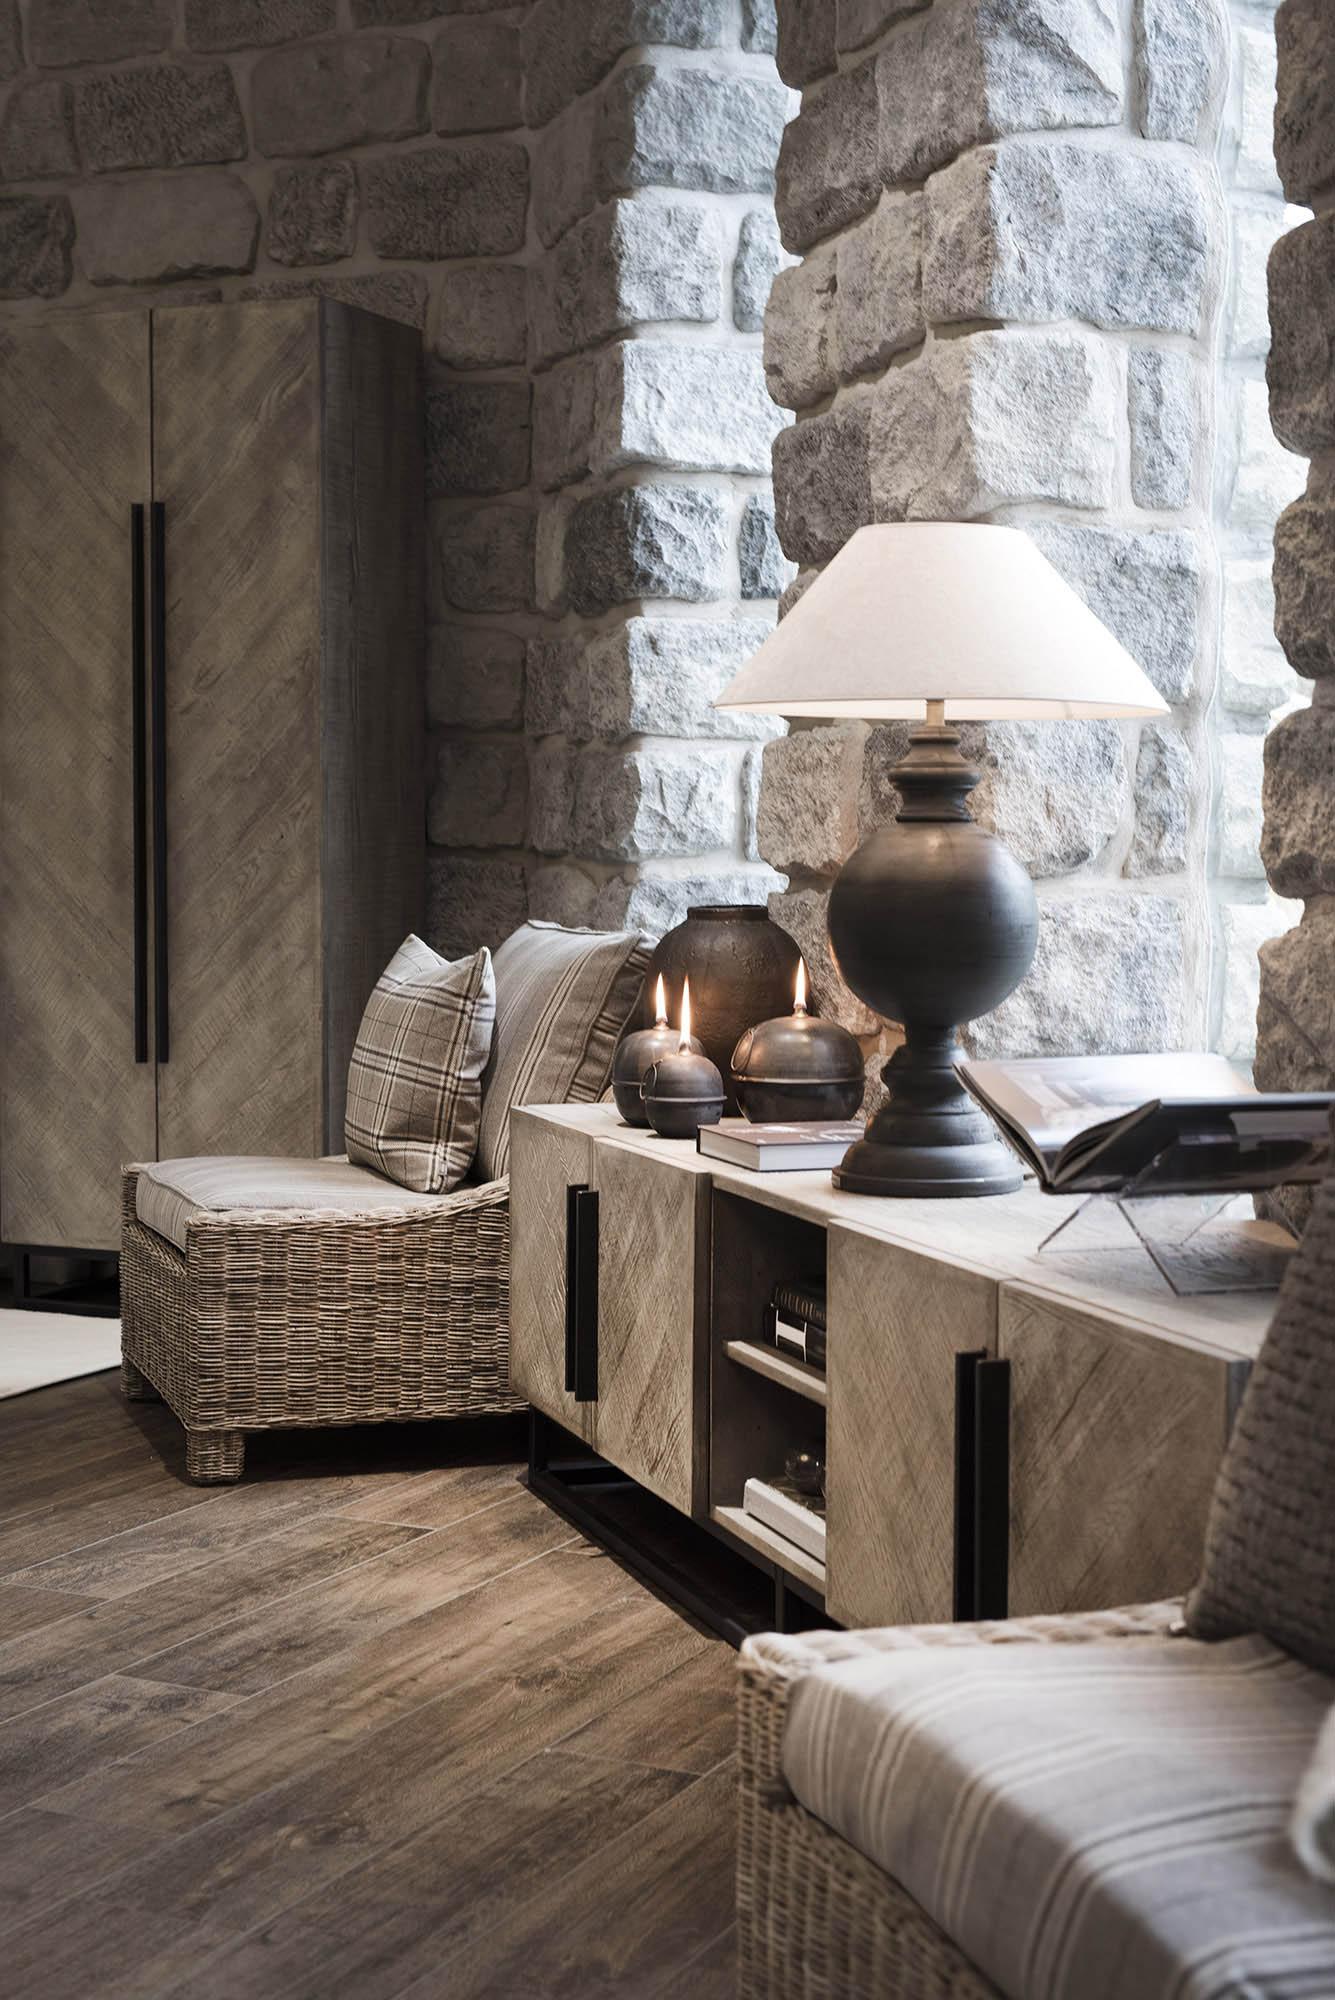 Miljöbild på sovrum med Vancouverskåp, Madison loungefåtölj i rotting och bordslampan Lazio.